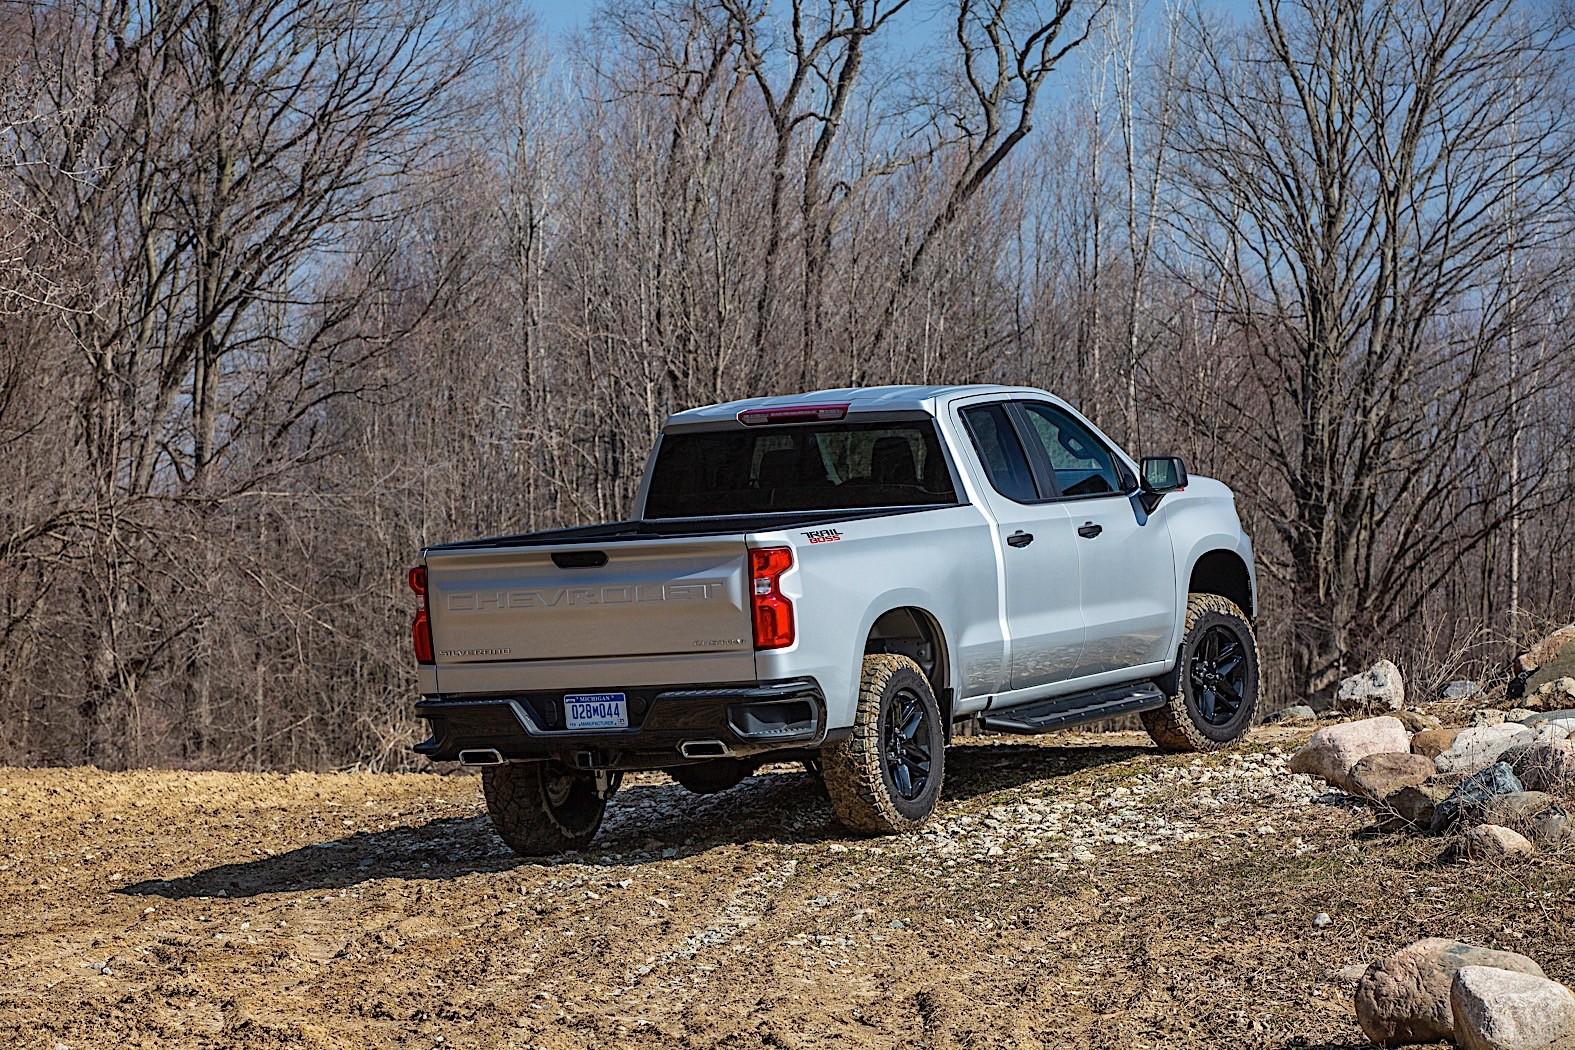 2020 Chevrolet Silverado 1500 Duramax Diesel Expected To Exceed 30